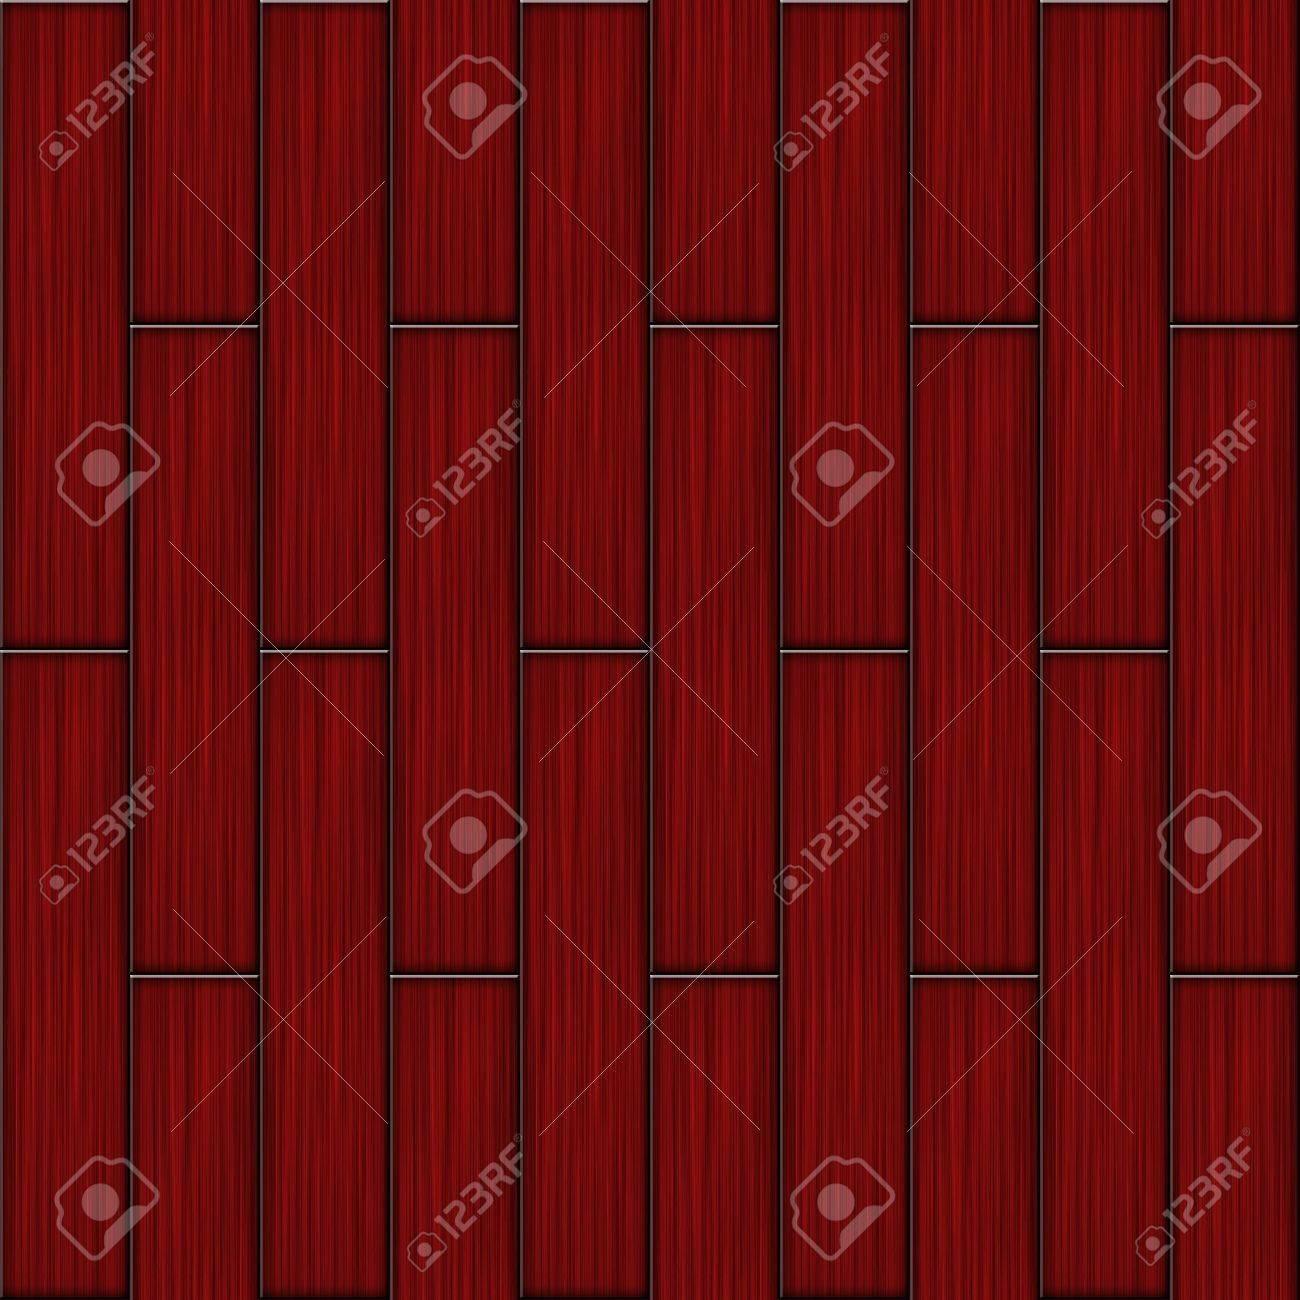 Red wood flooring parquet seamless square texture. Stock Photo - 5997668 - Red Wood Flooring Parquet Seamless Square Texture. Stock Photo